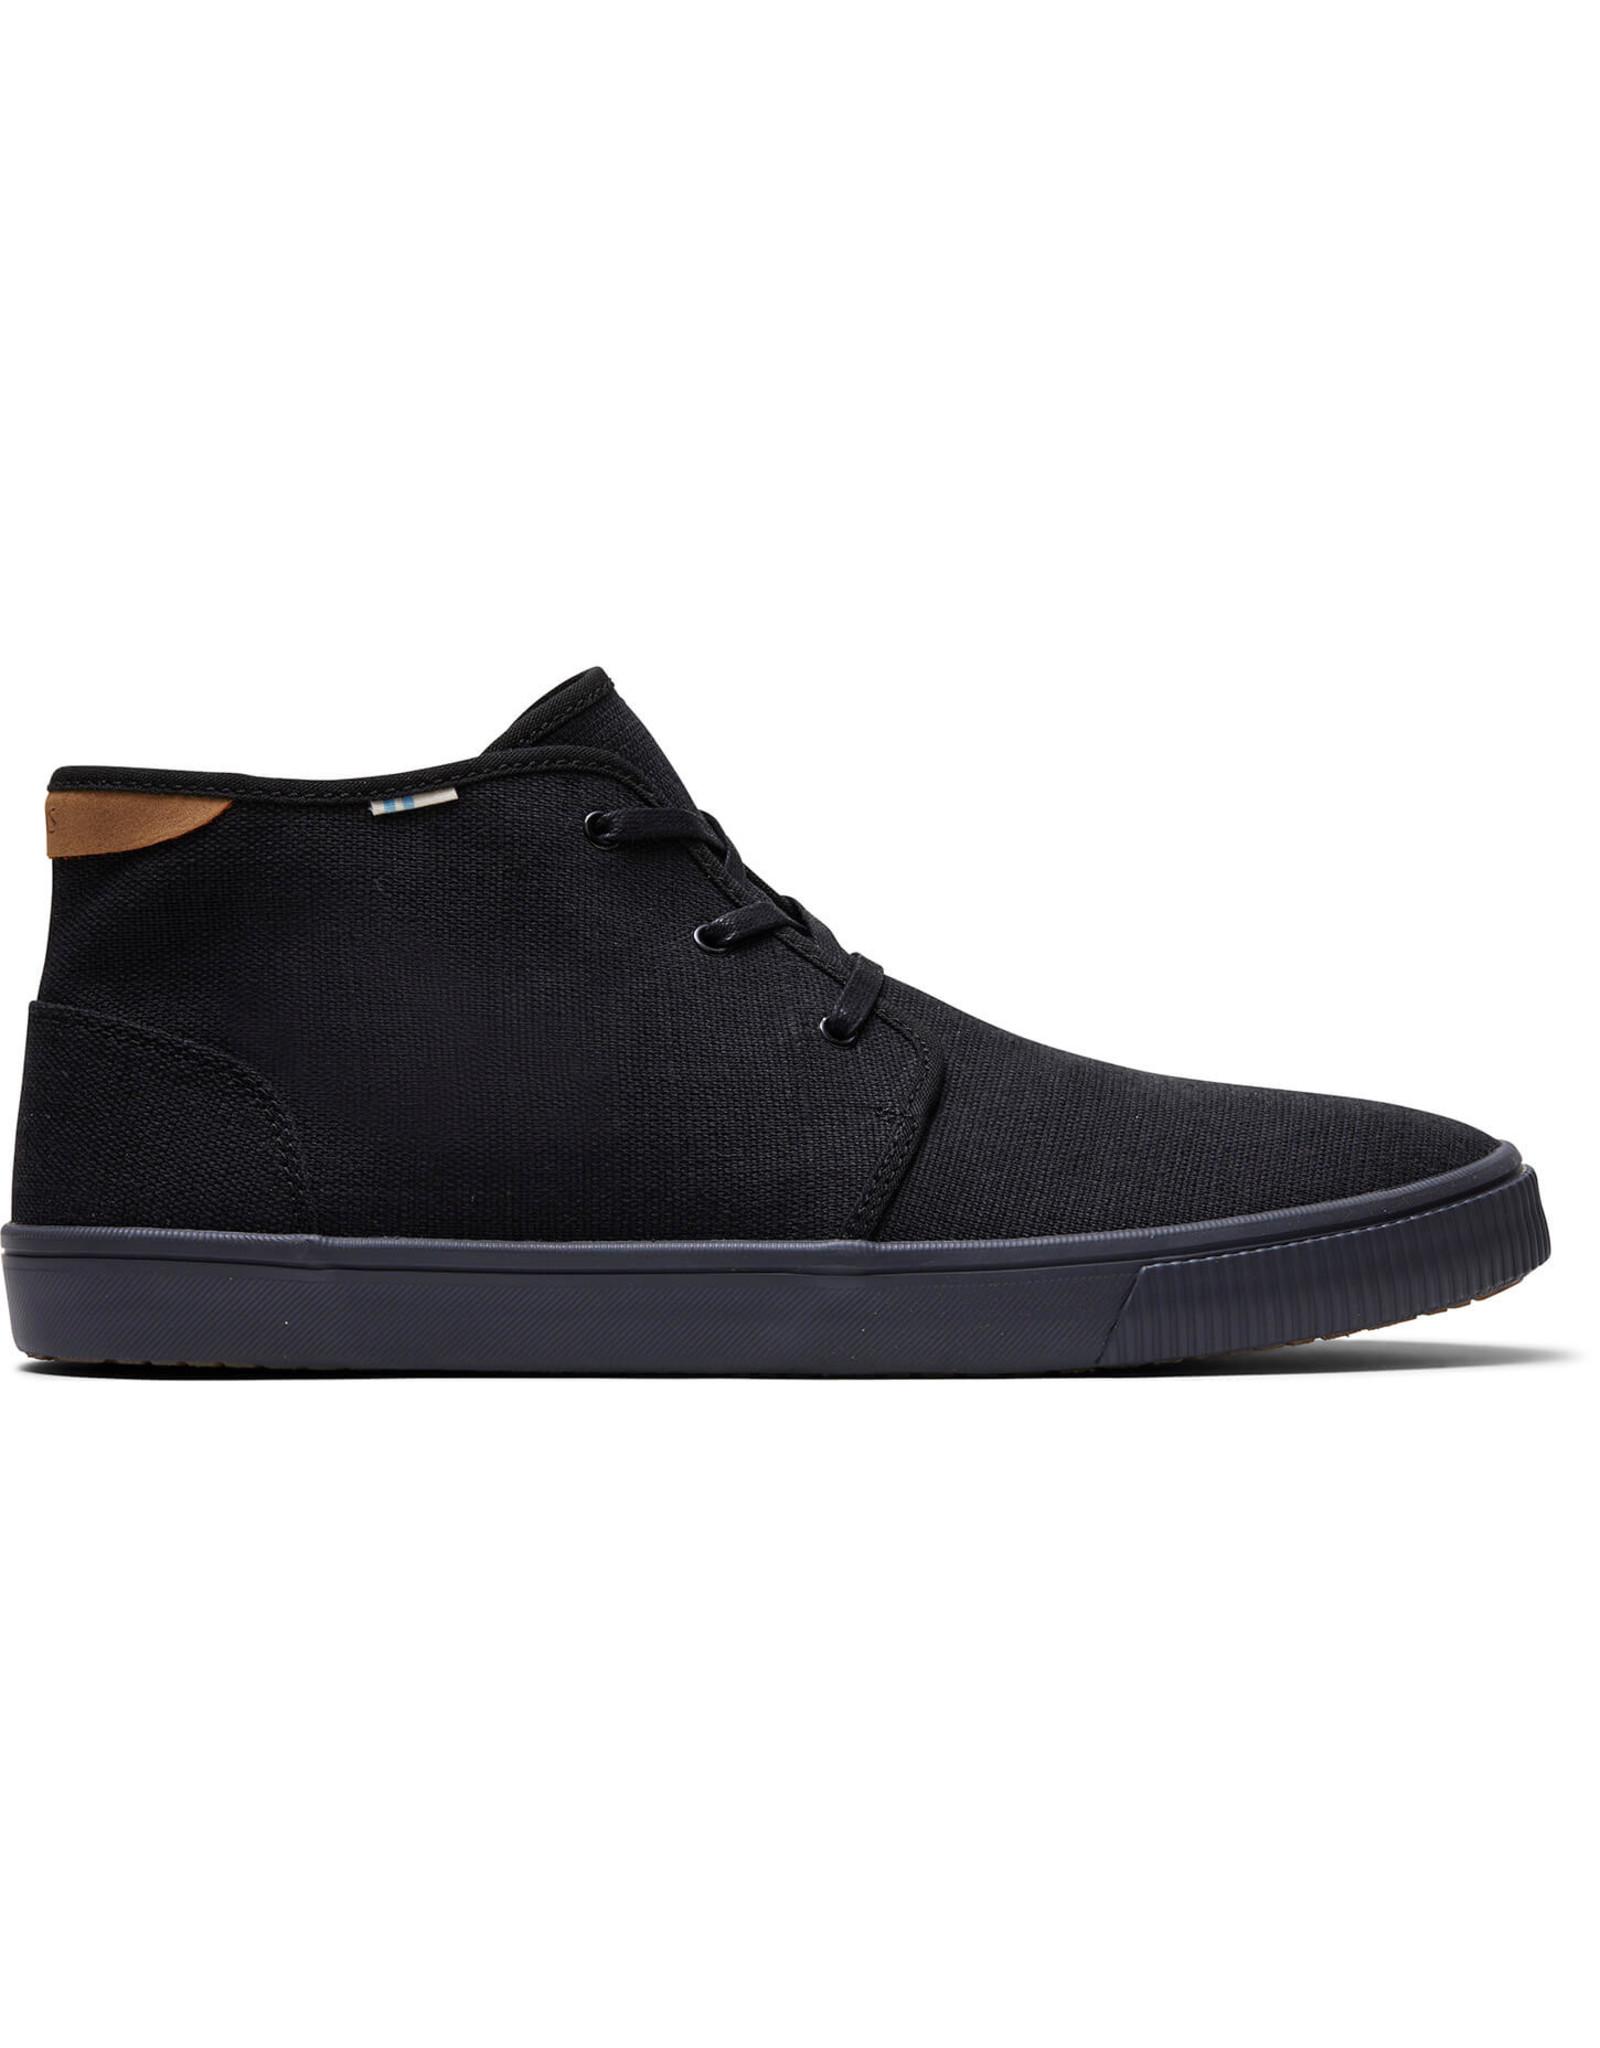 TOMS Men's Carlos Mid Sneaker